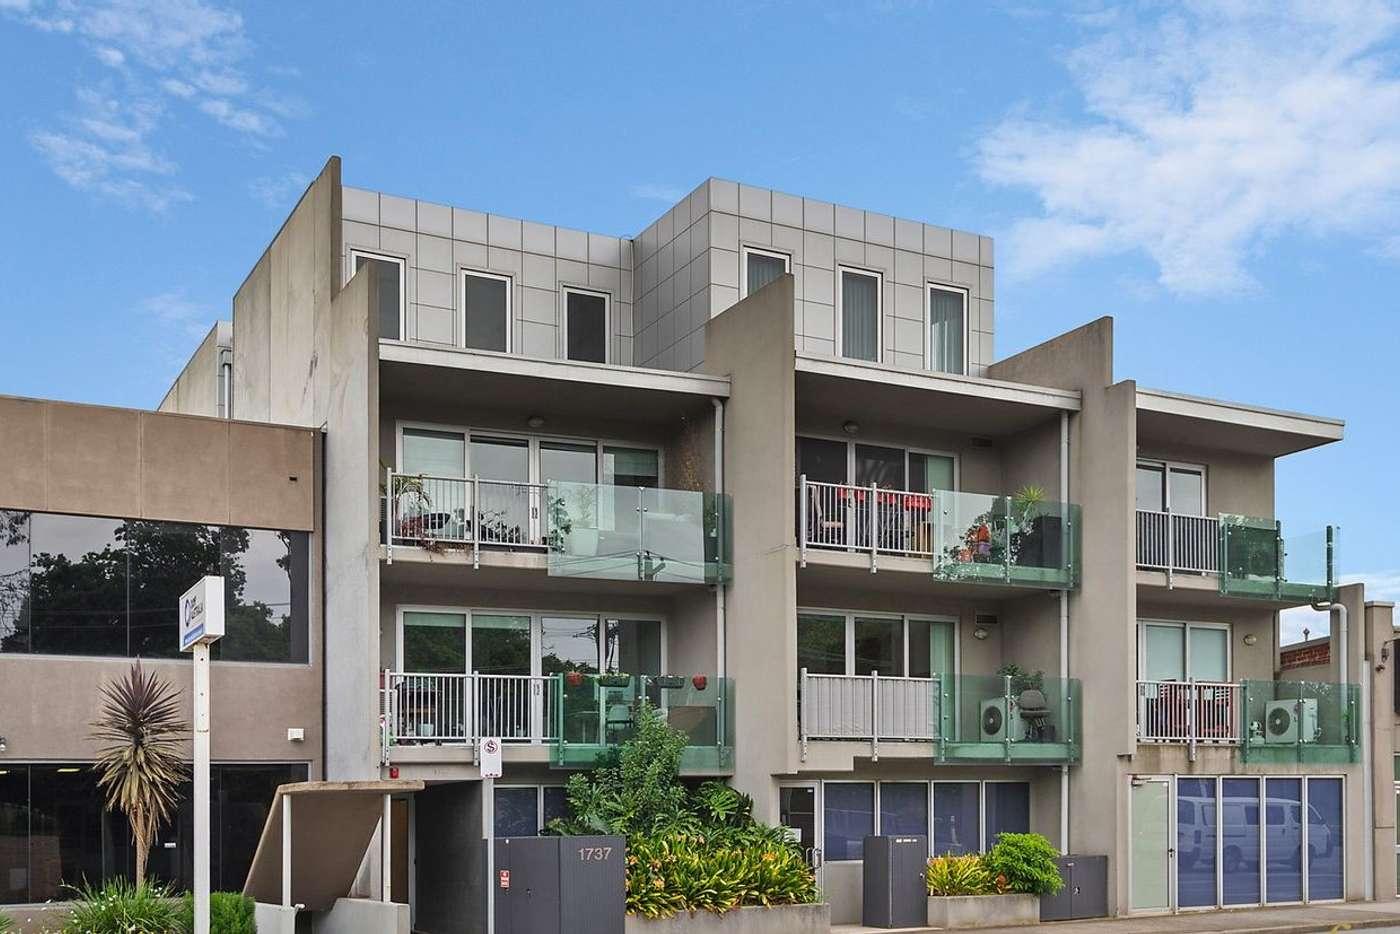 Main view of Homely apartment listing, 3/1737 Malvern Road, Glen Iris VIC 3146